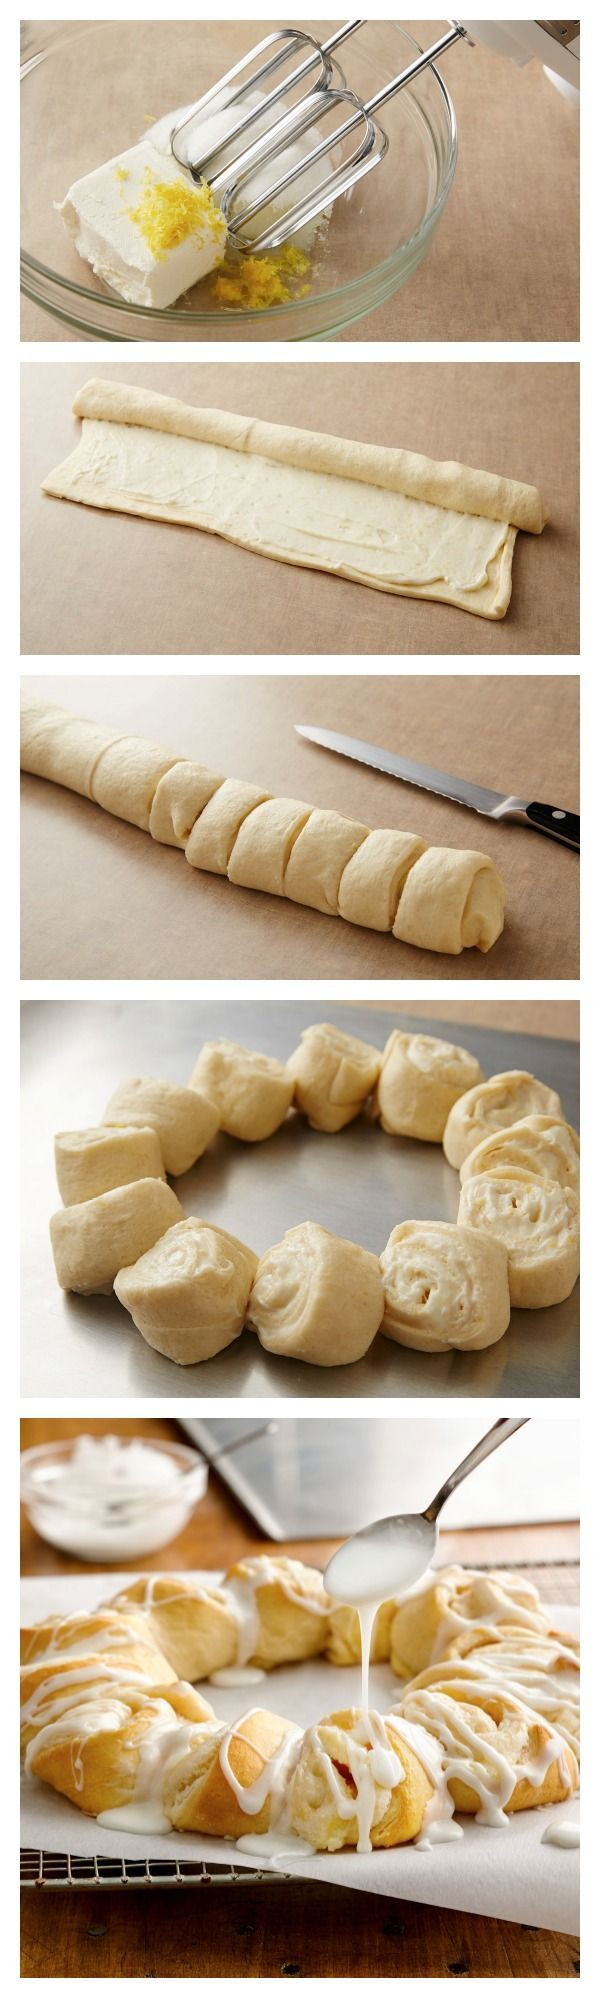 Lemon-Cream Cheese Crescent Ring Recipe Ingredients: Crescent Ring 1 package (3 oz) cream cheese, softened 1/4 cup granulated sugar 1 tablespoon fresh lemon juice 2 teaspoons grated lemon peel 1 ca...